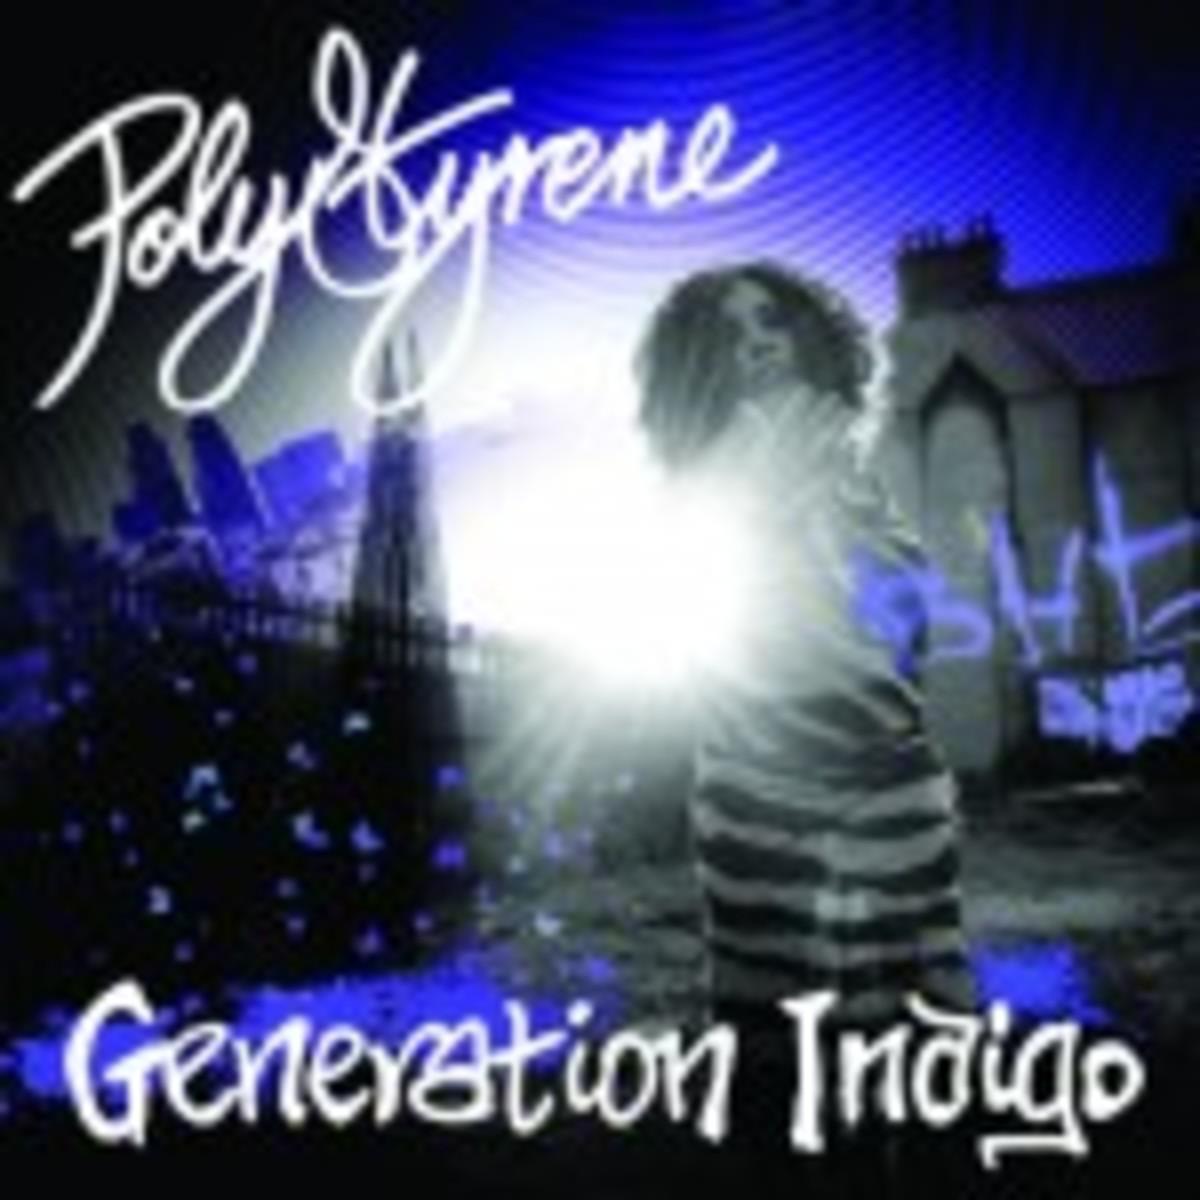 Poly Styrene Generation Indigo